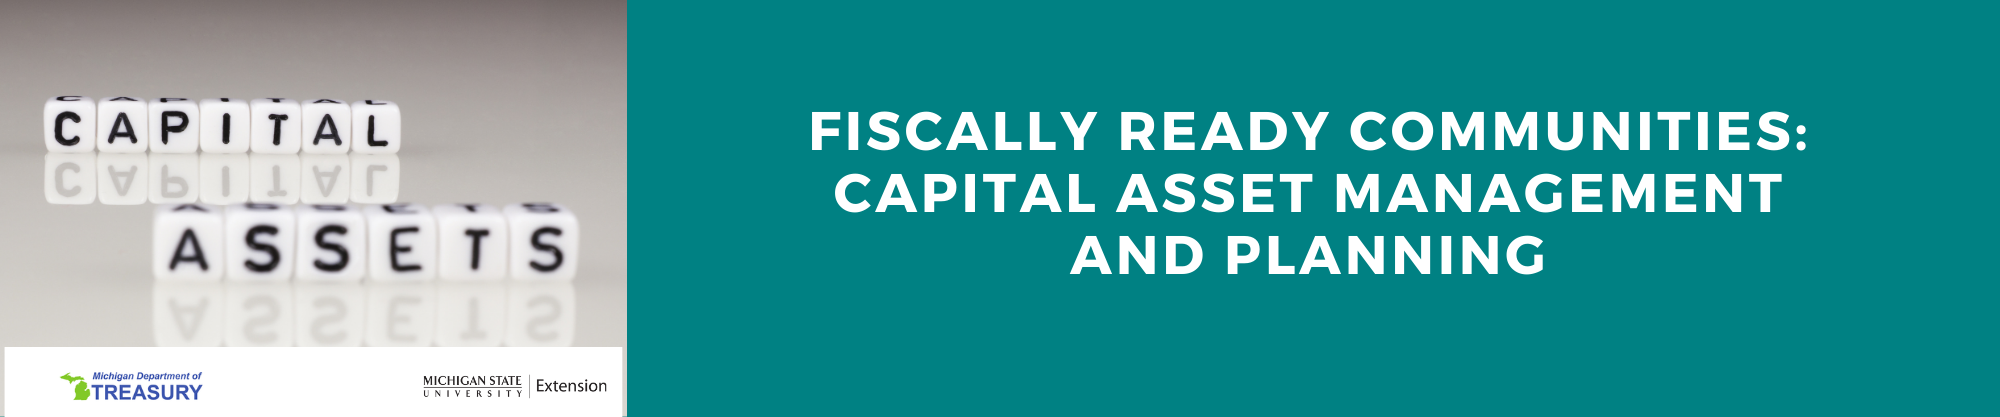 Image of capital asset management logo.